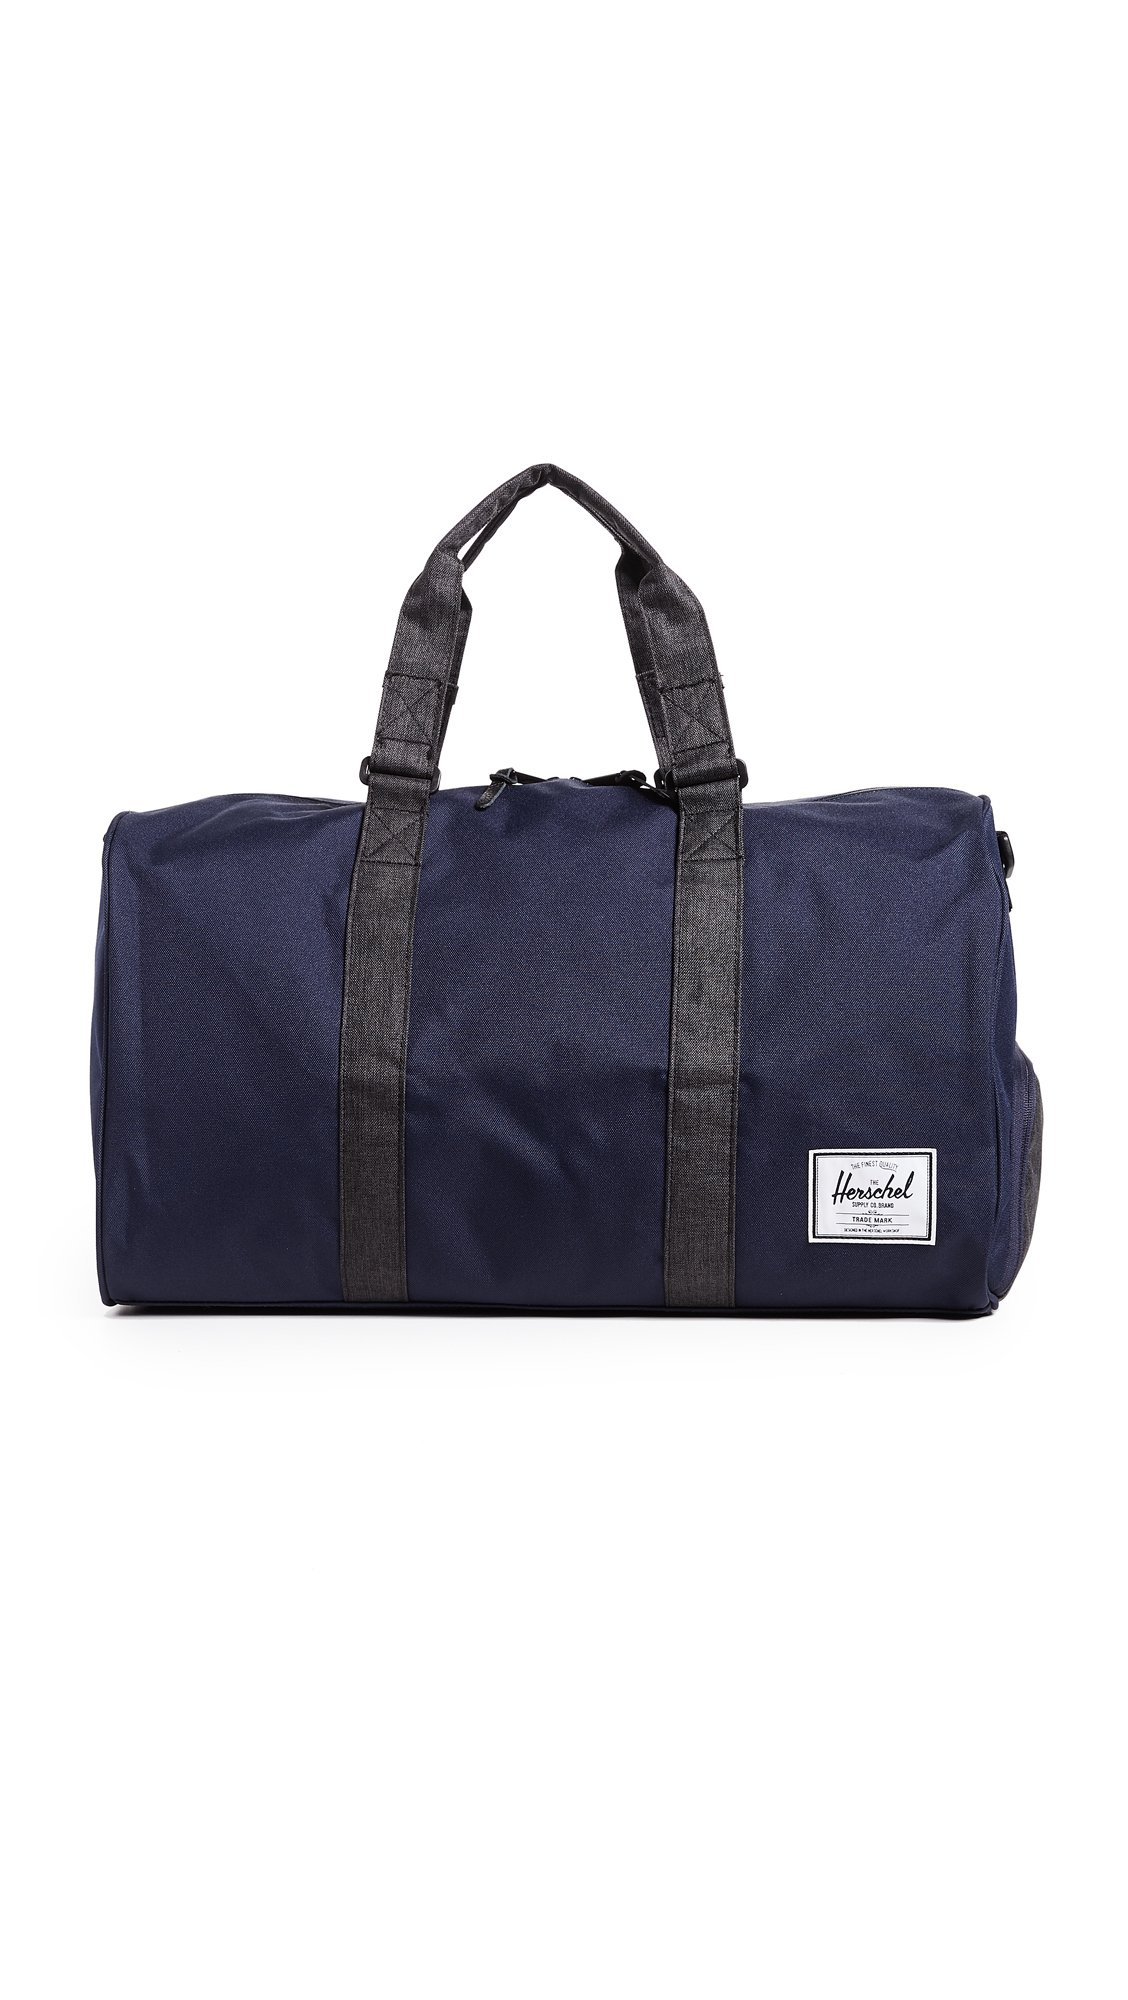 Herschel Supply Co. Novel Duffel Bag, Peacoat/Black Crosshatch, One Size